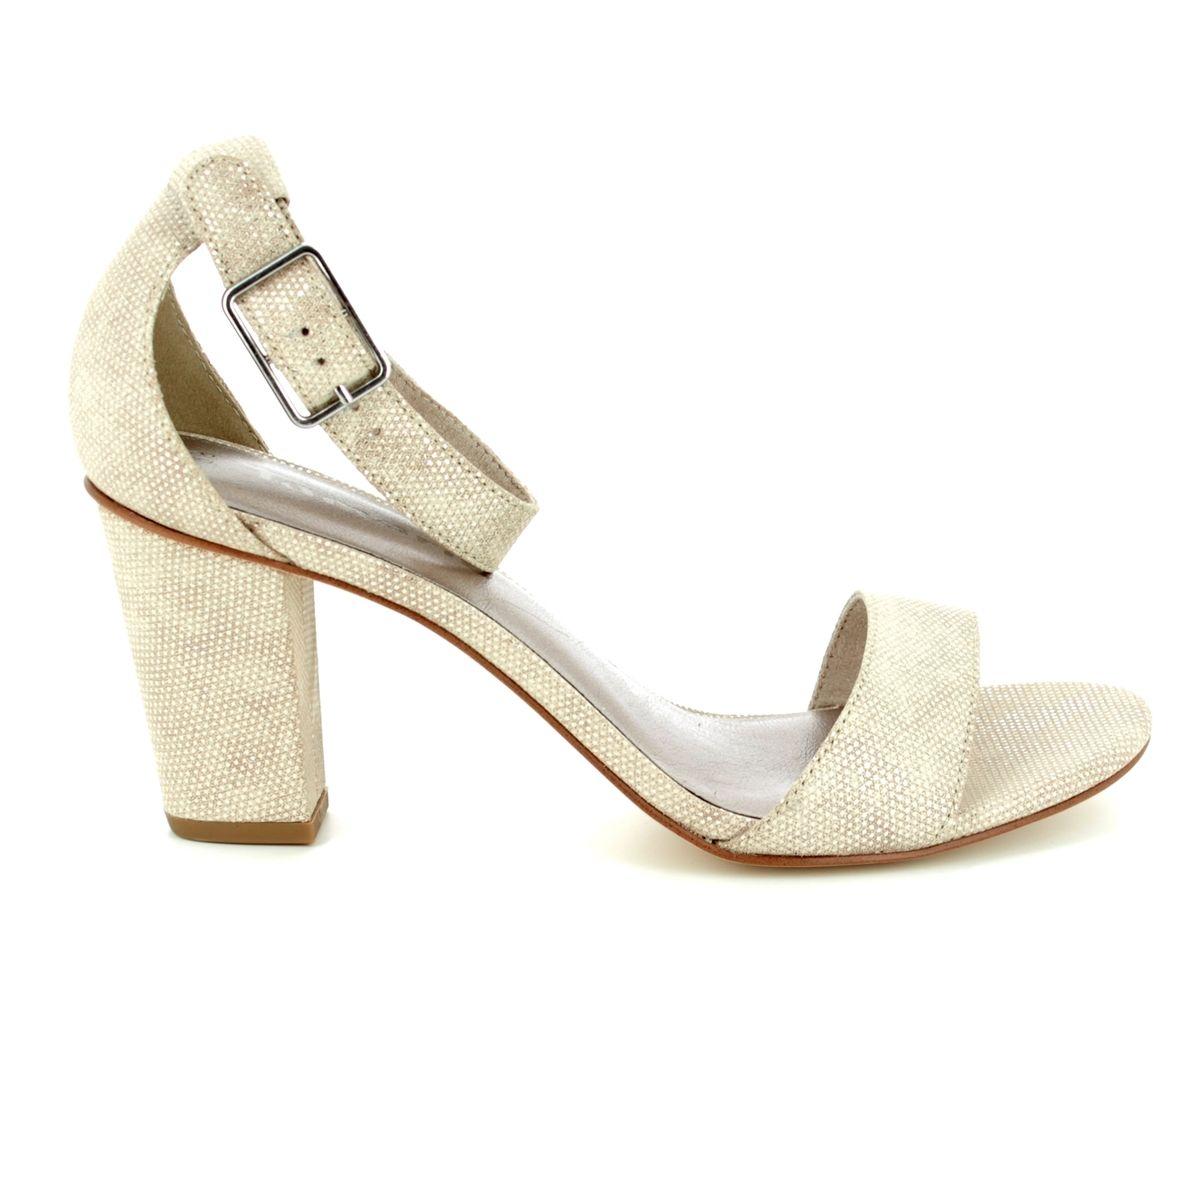 2e2c436b1592 Tamaris Heeled Sandals - Ivory - 28397 20 454 HEITI